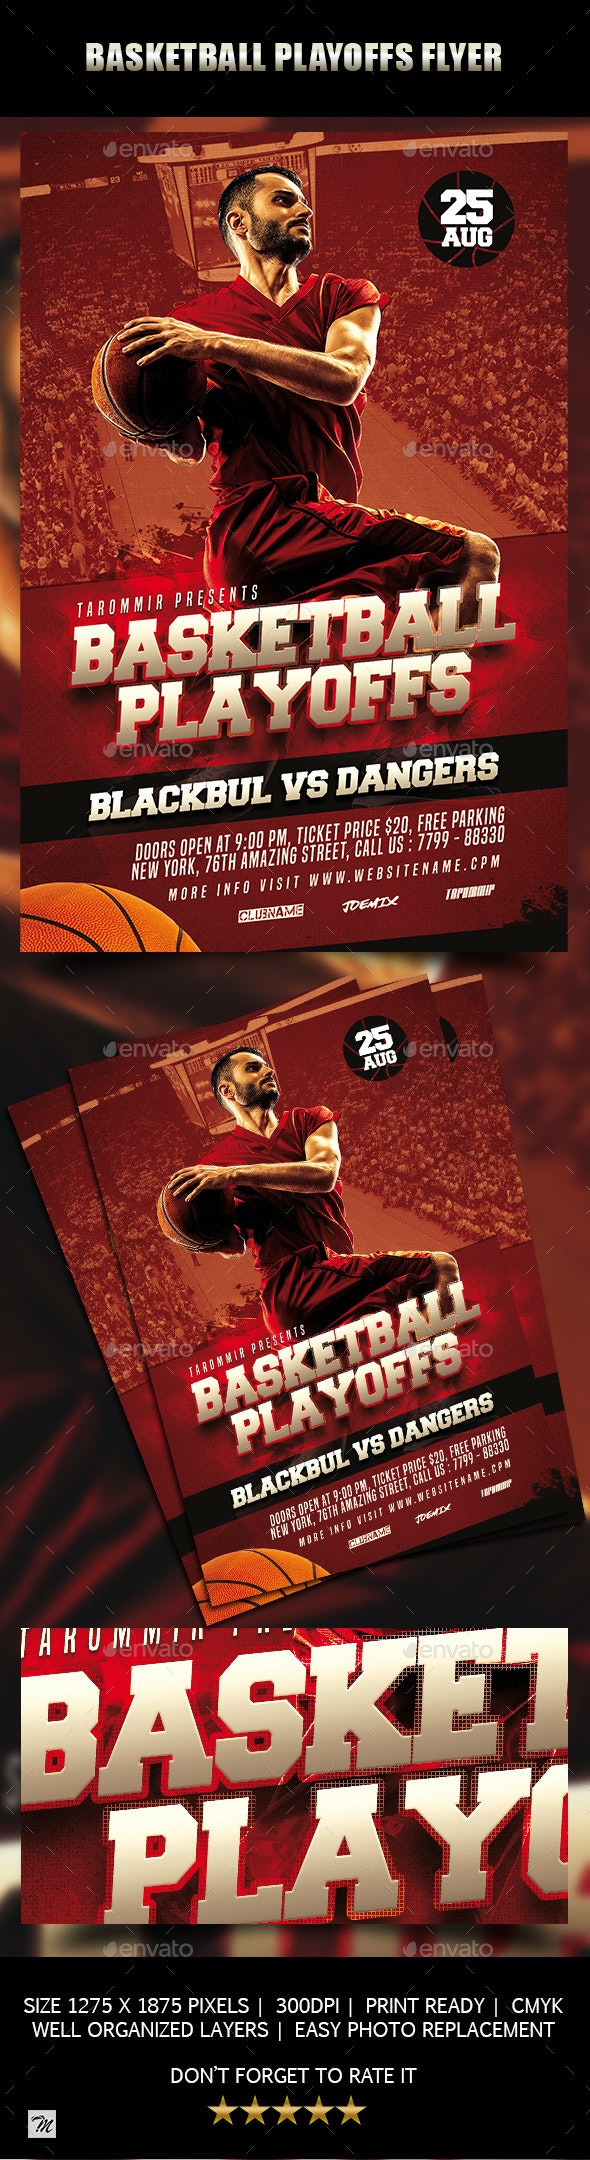 Basketball Playoffs Flyer - Sports Events